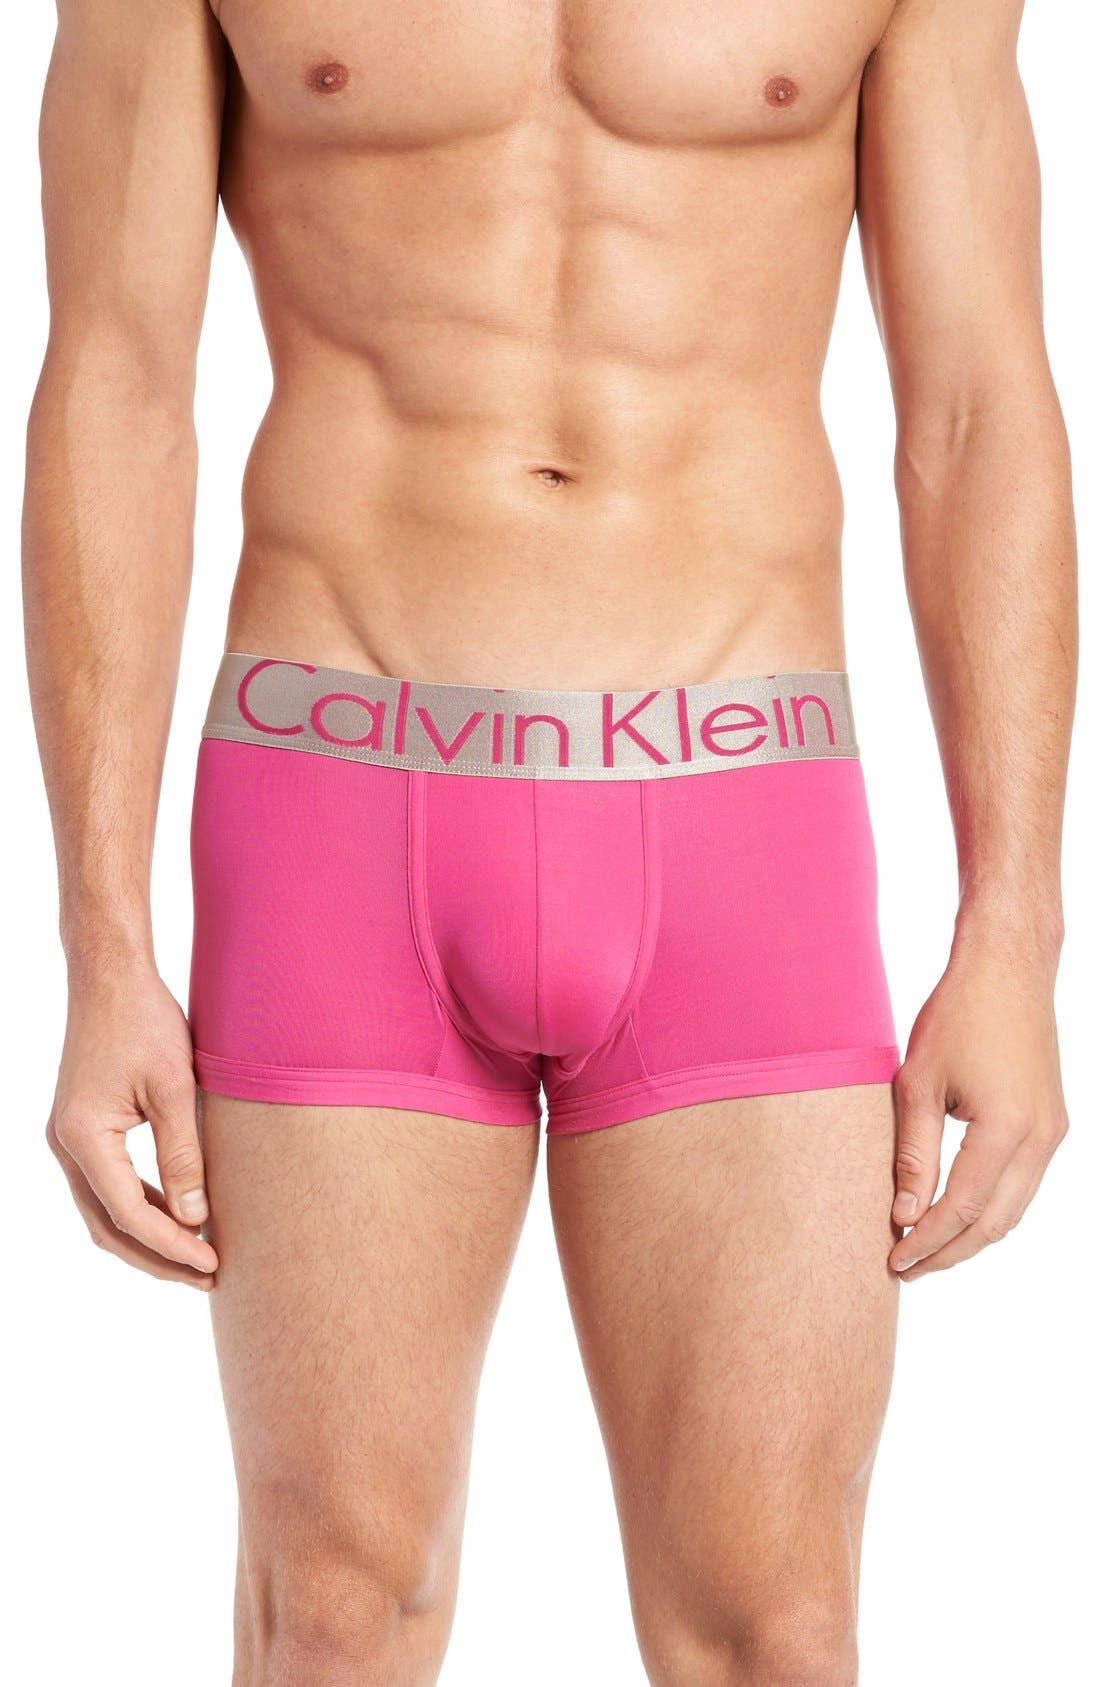 Alternate Image 1 Selected - Calvin Klein Steel U2716 Microfiber Low Rise Trunks